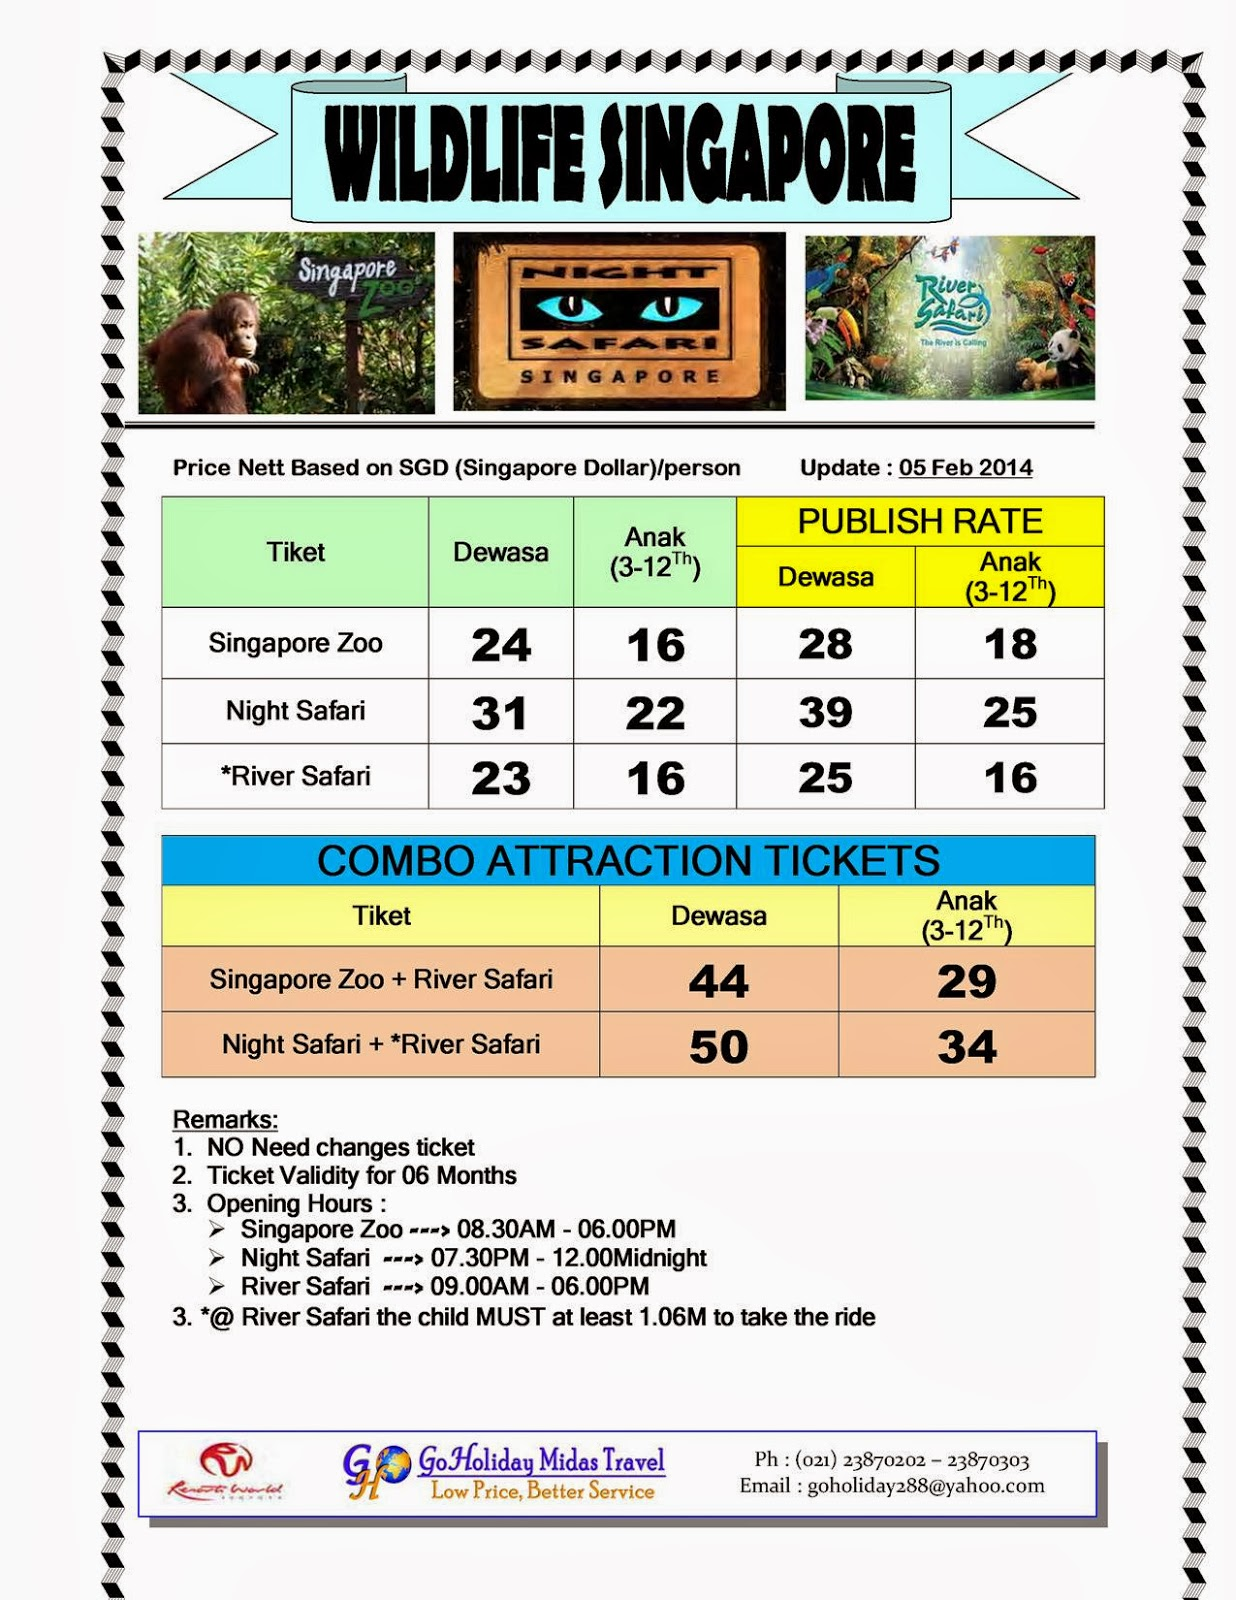 Gho Holiday Travel Februari 2014 Singapore Et Ticket Night Safari Dewasa Kini Tersedia Tiket Wildlife Zoo Di Goholiday